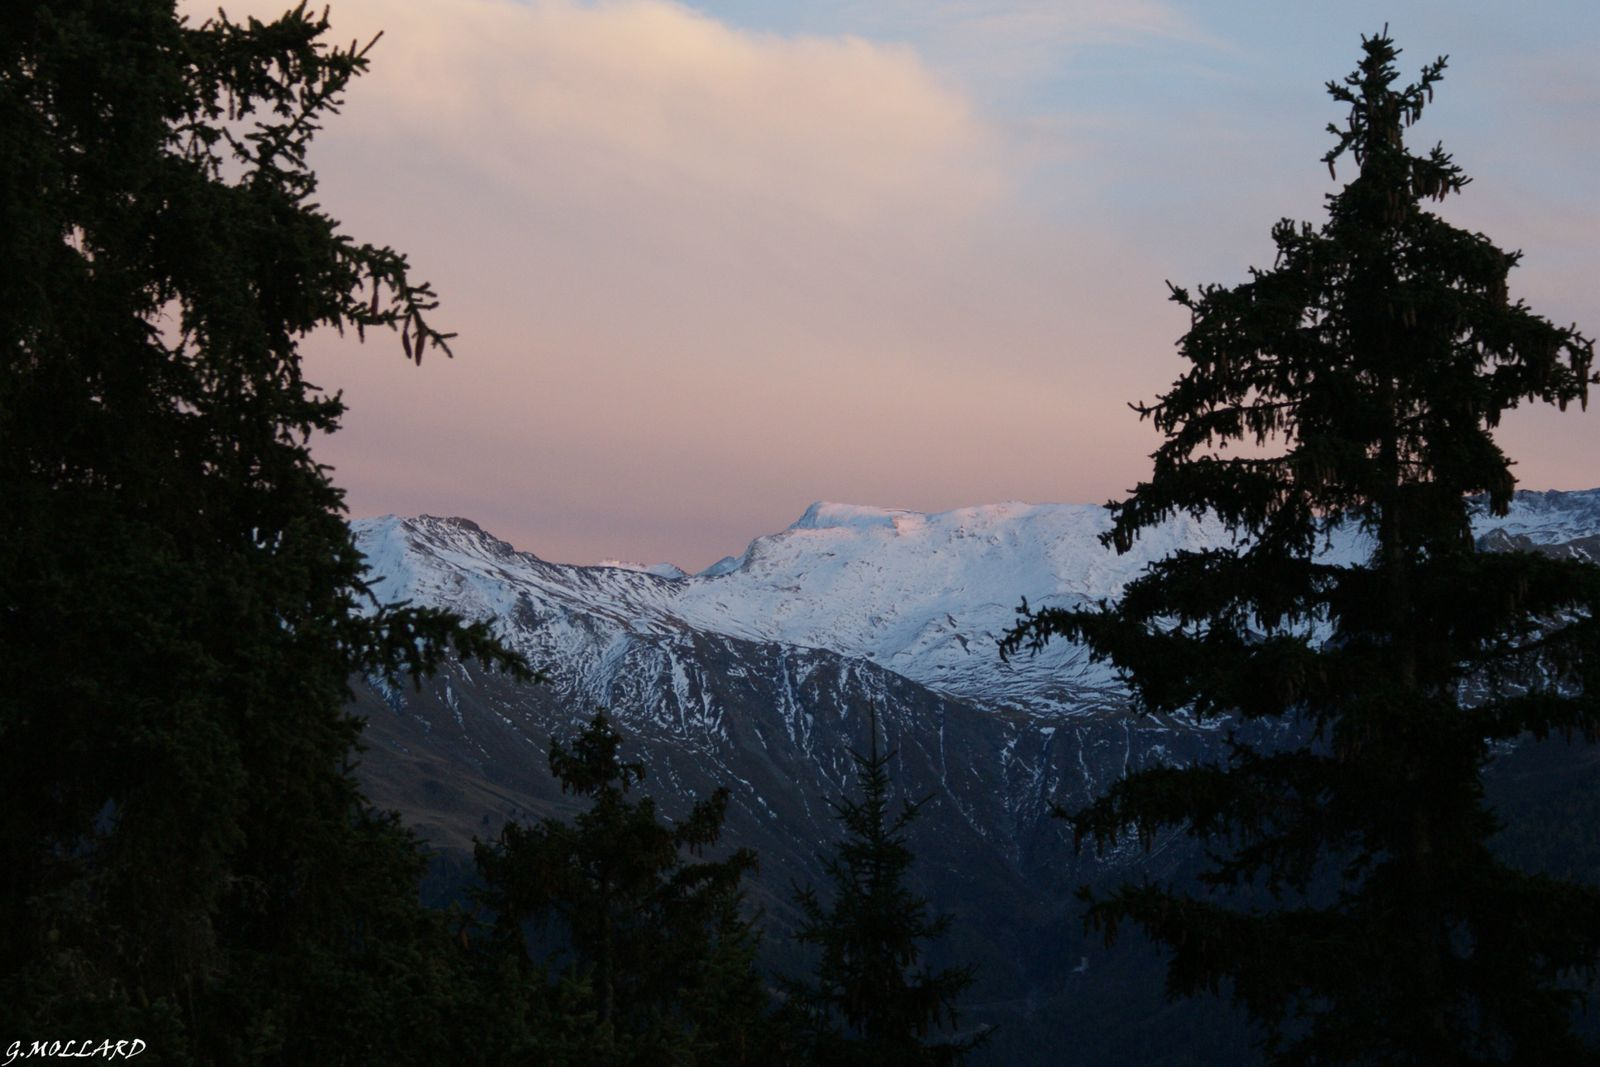 Modane,Val-Fréjus,col Vallée étroite,col de la Roue,Italie